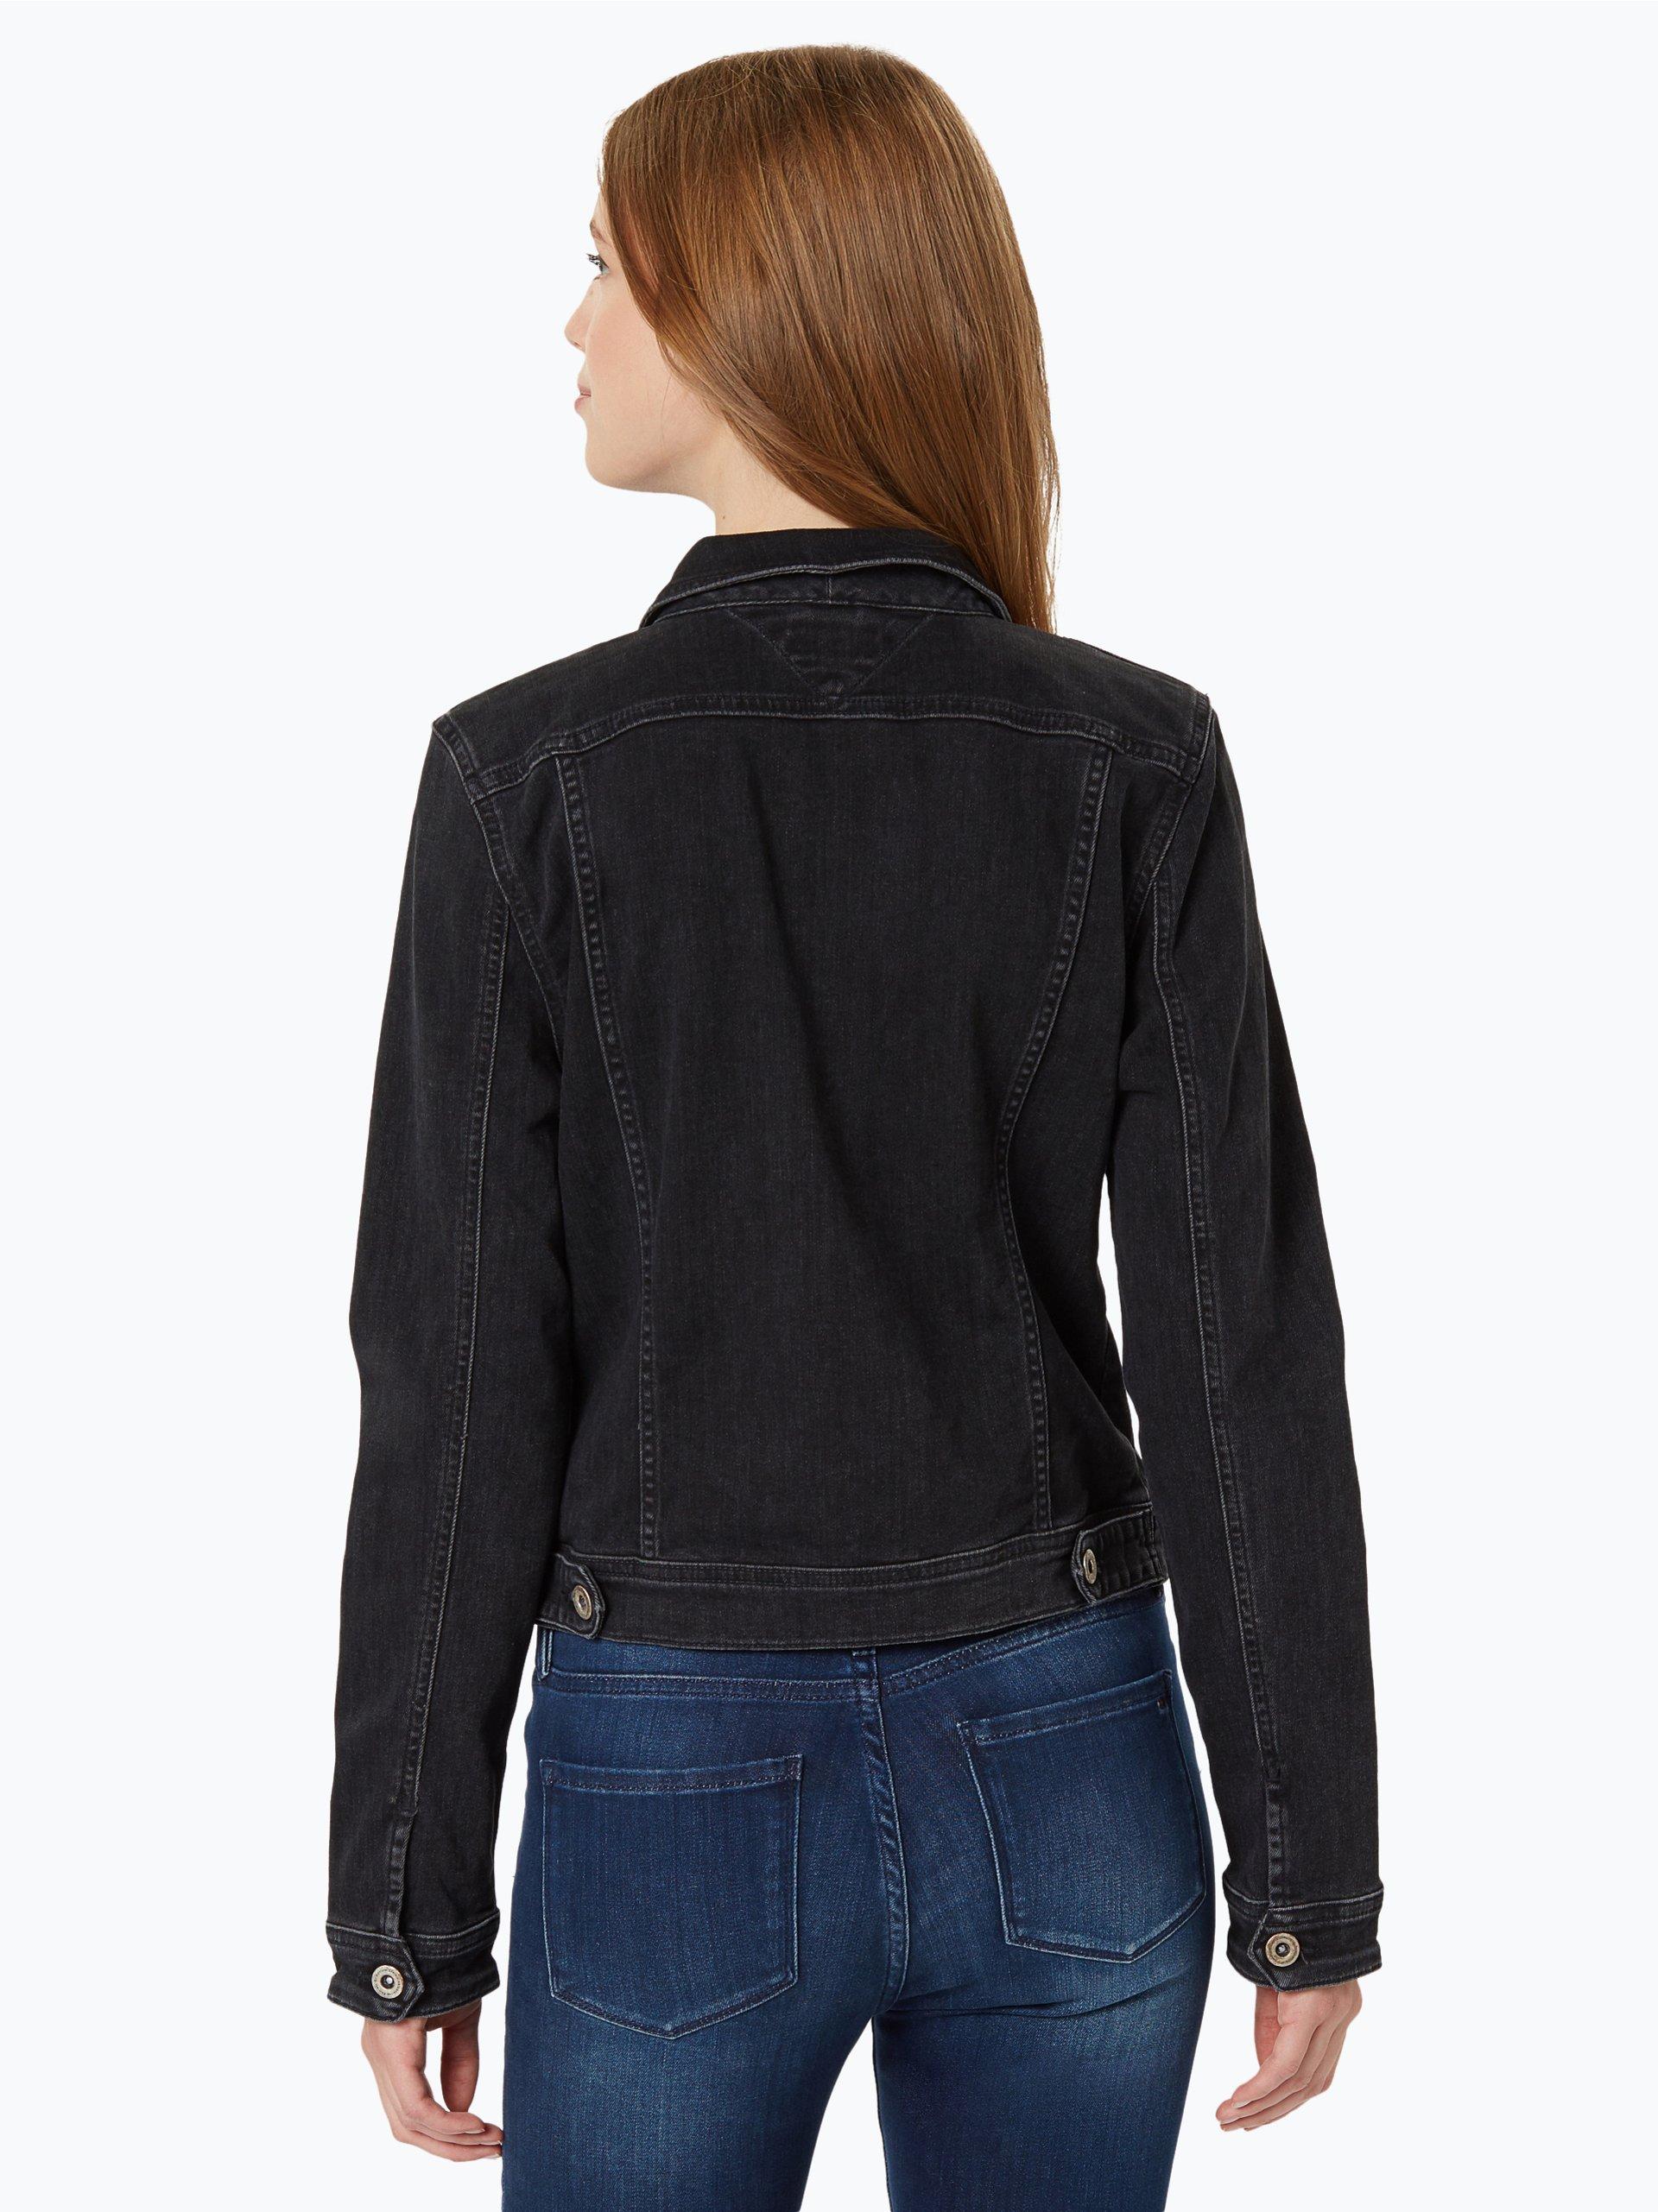 tommy jeans damen jeansjacke trucker 26 schwarz uni online kaufen vangraaf com. Black Bedroom Furniture Sets. Home Design Ideas